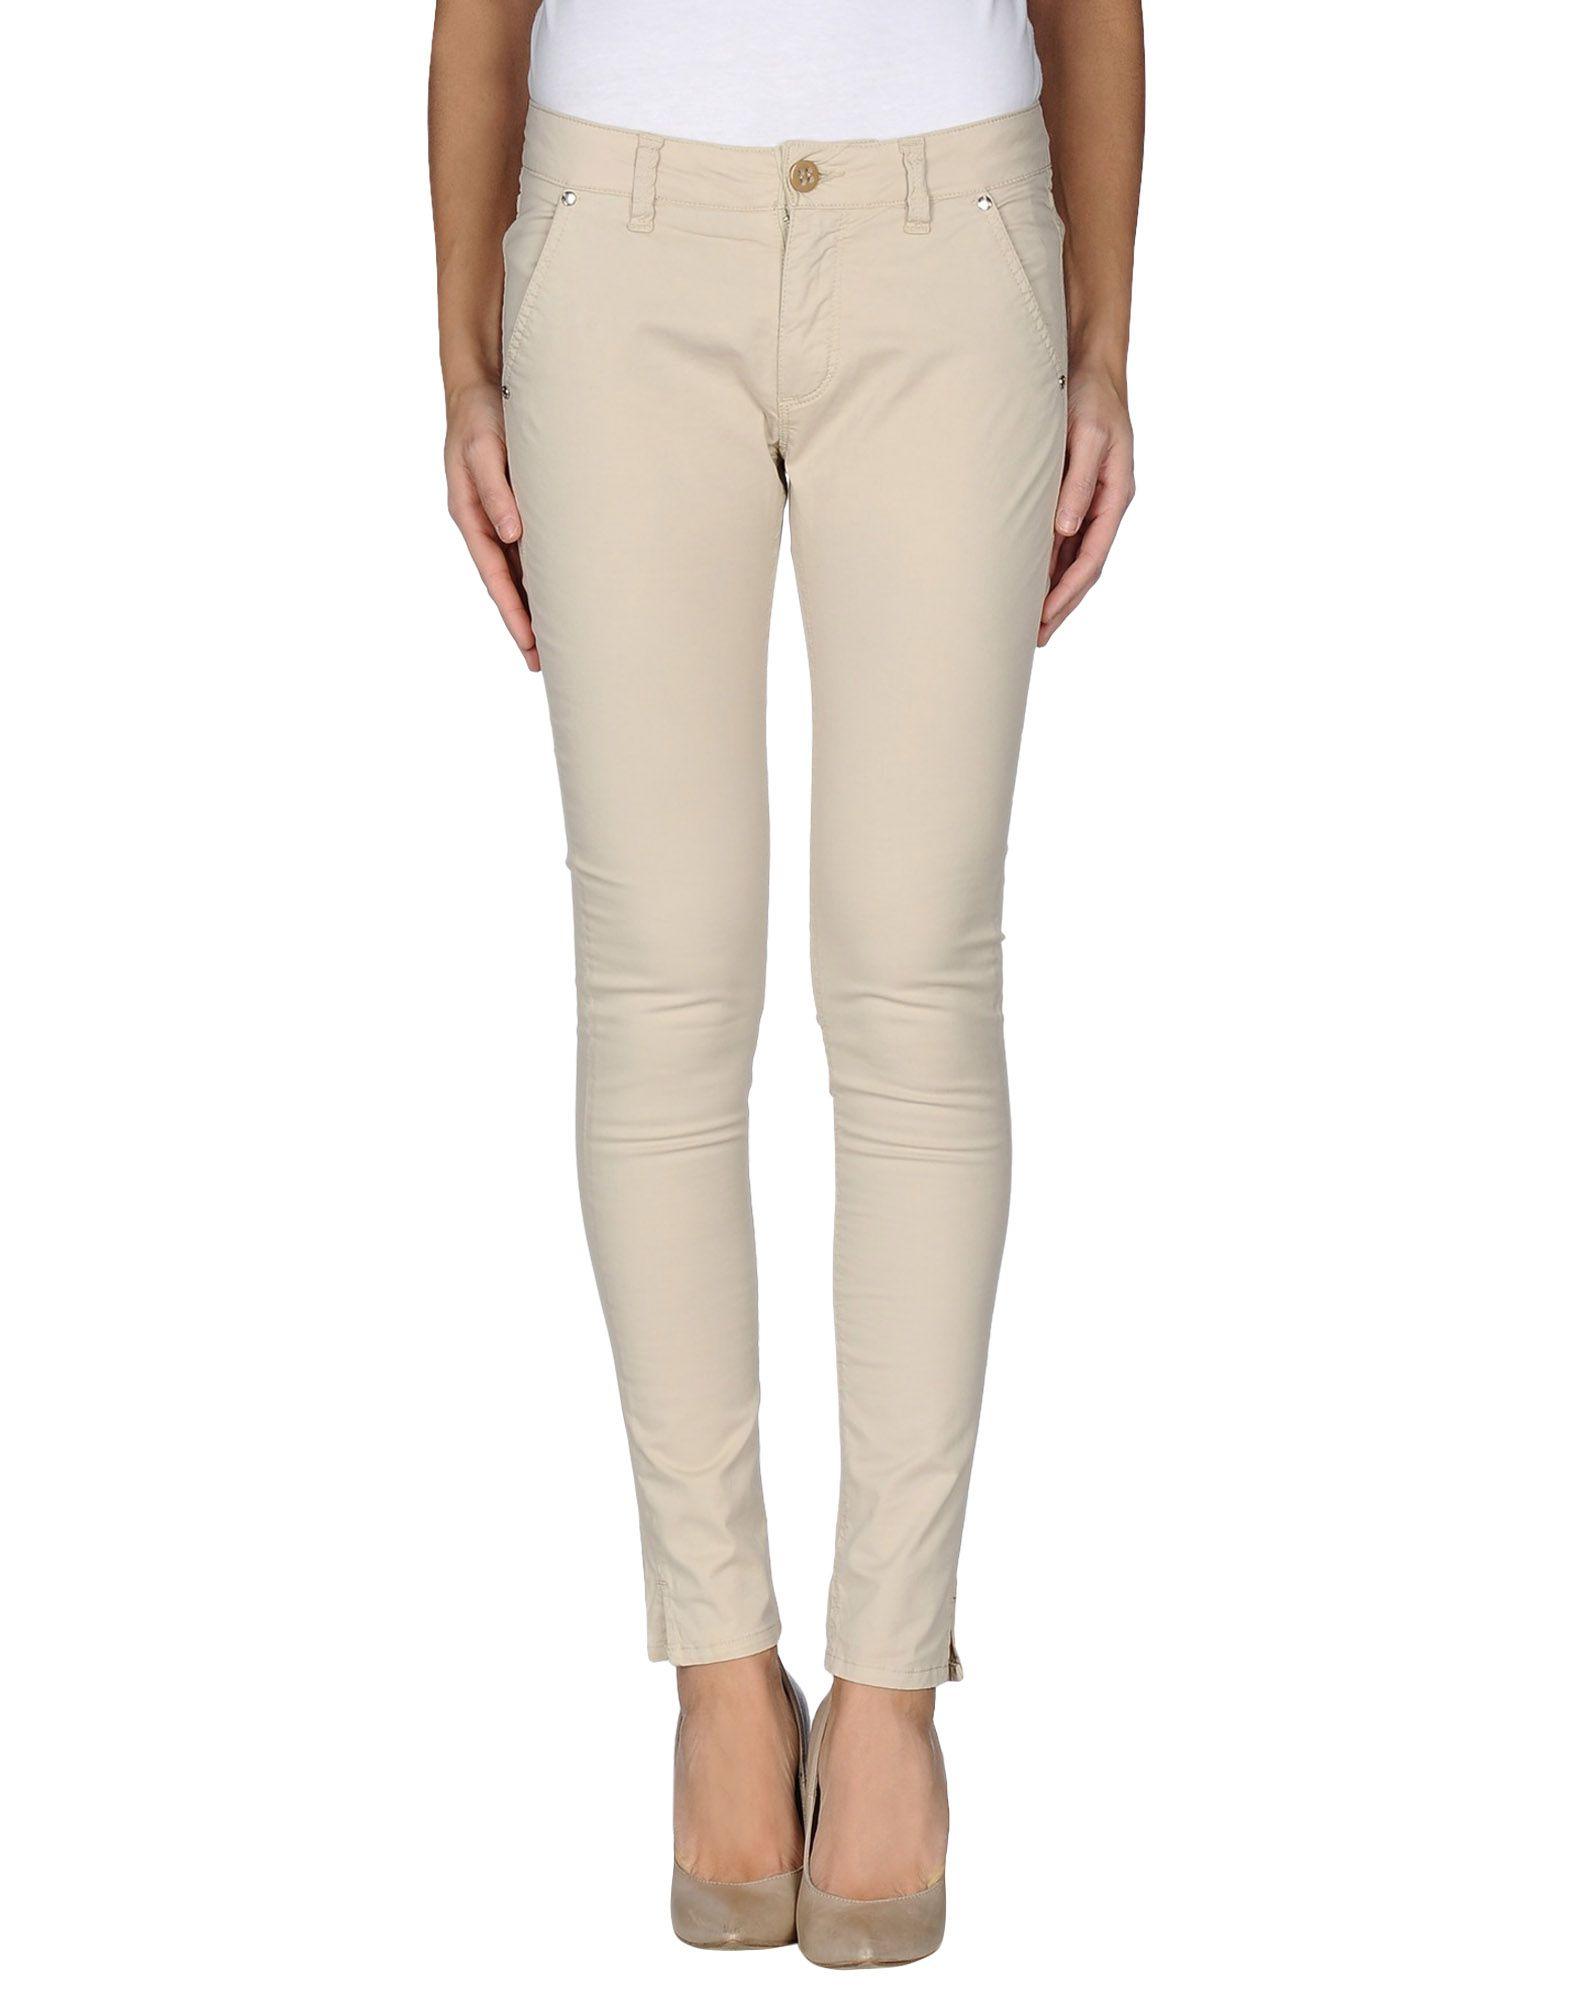 Wonderful  Roberto Cavalli Beige Women39s Pants Leggings Pants Women Discount Sale